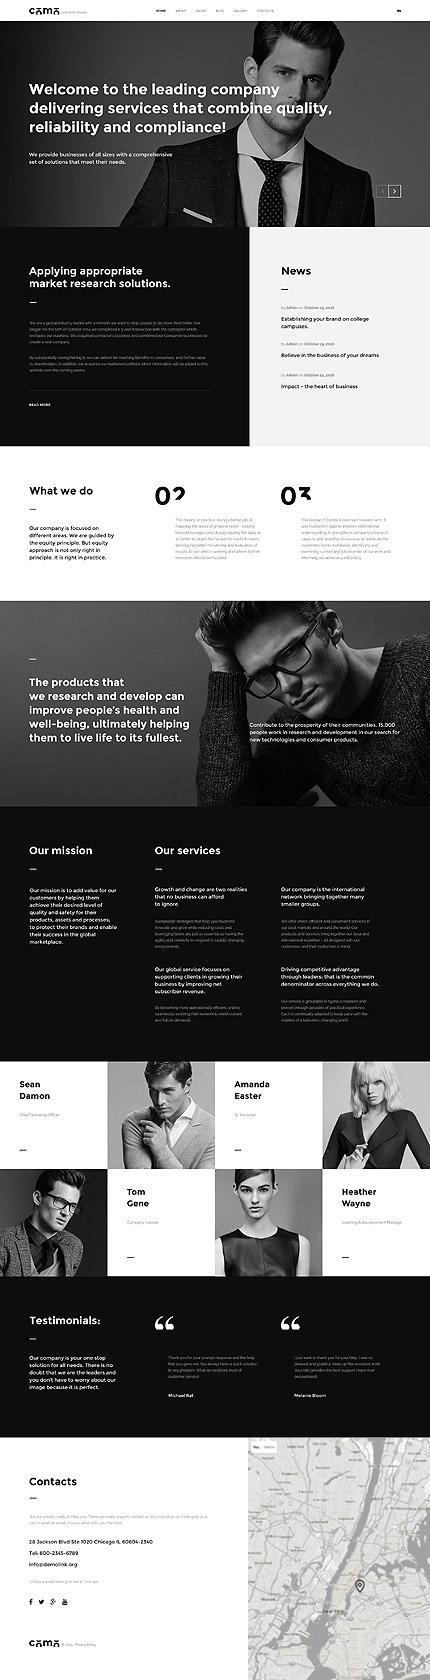 Joomla Theme/Template 57742 Main Page Screenshot